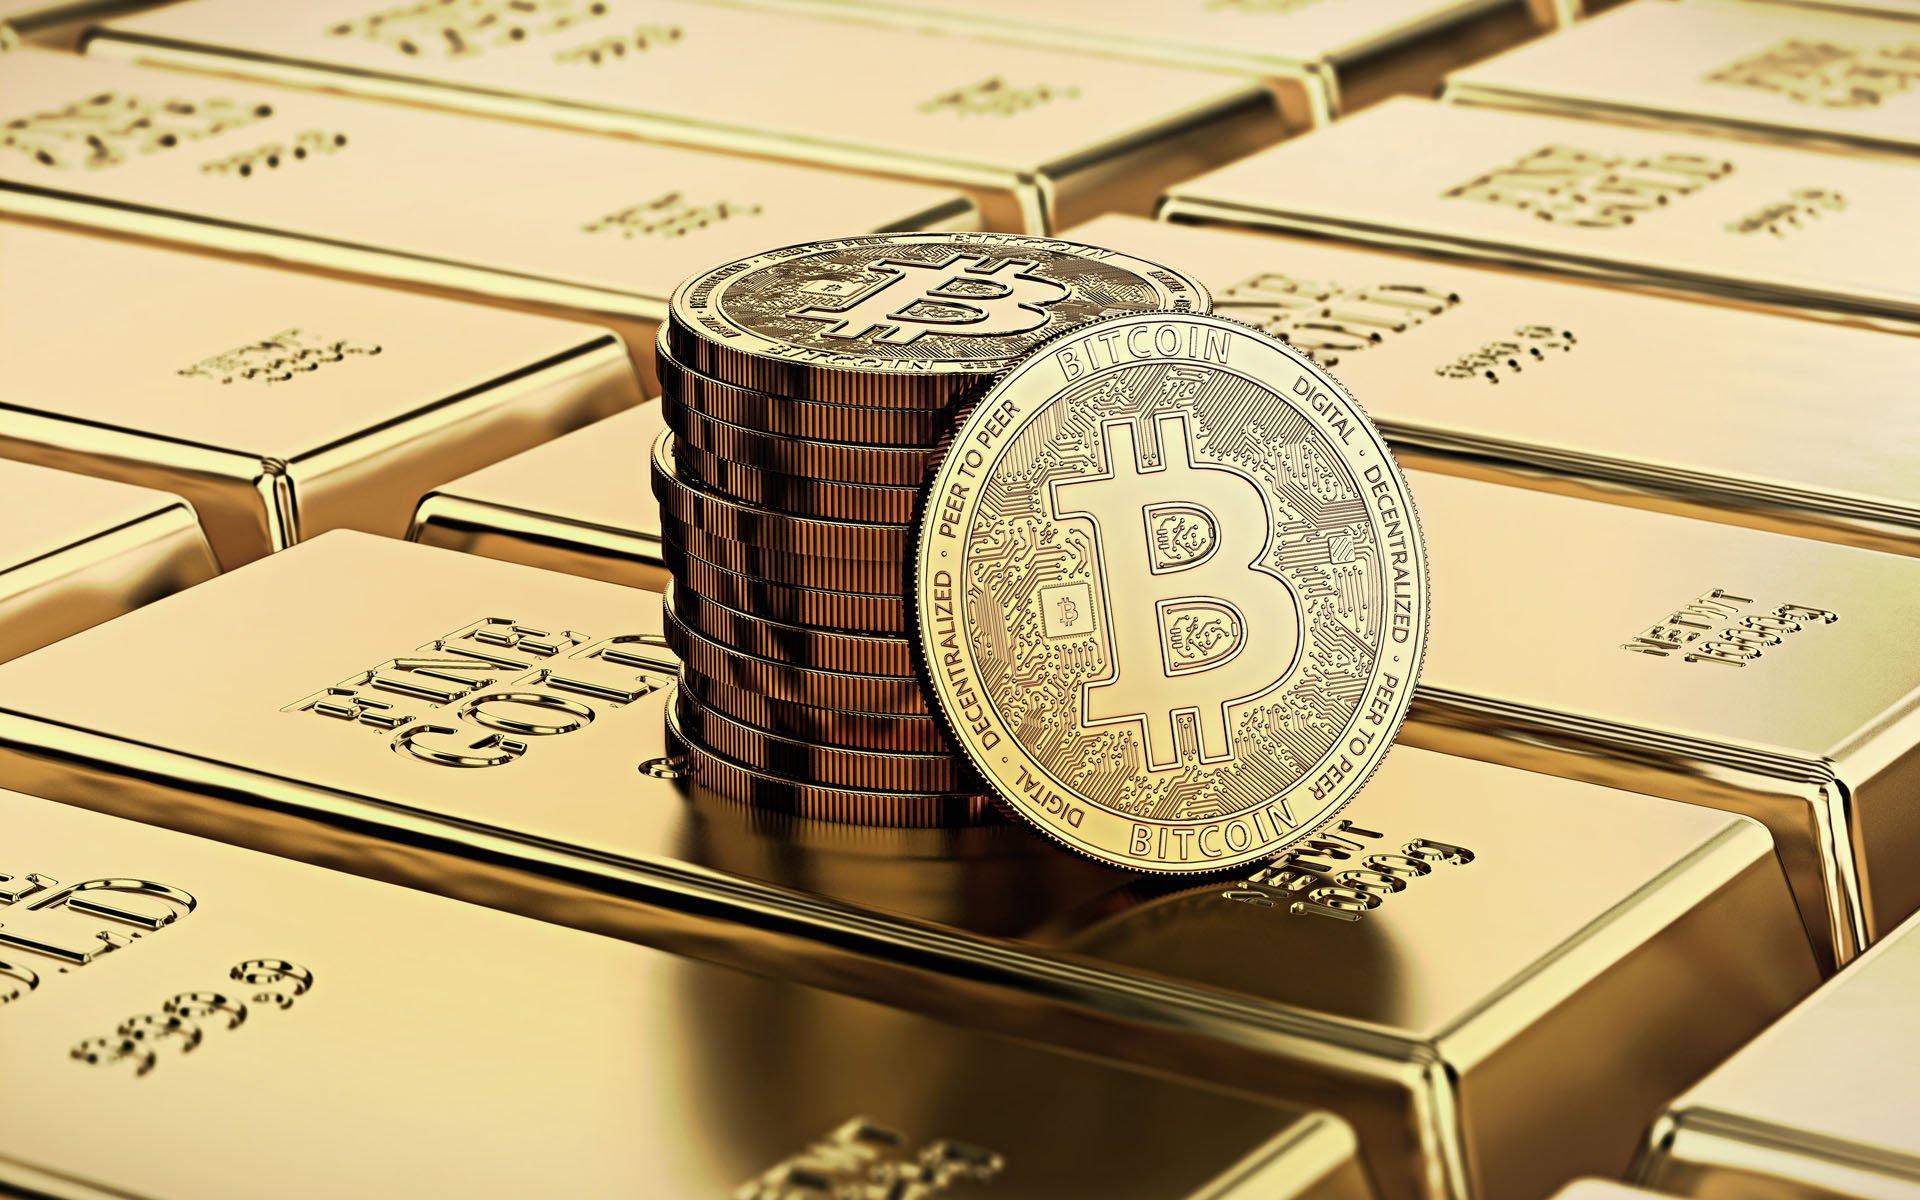 Lider Varlik yonetimi firmasinin CEOsu Bitcoin Konusunda Fikrini Degistirdi